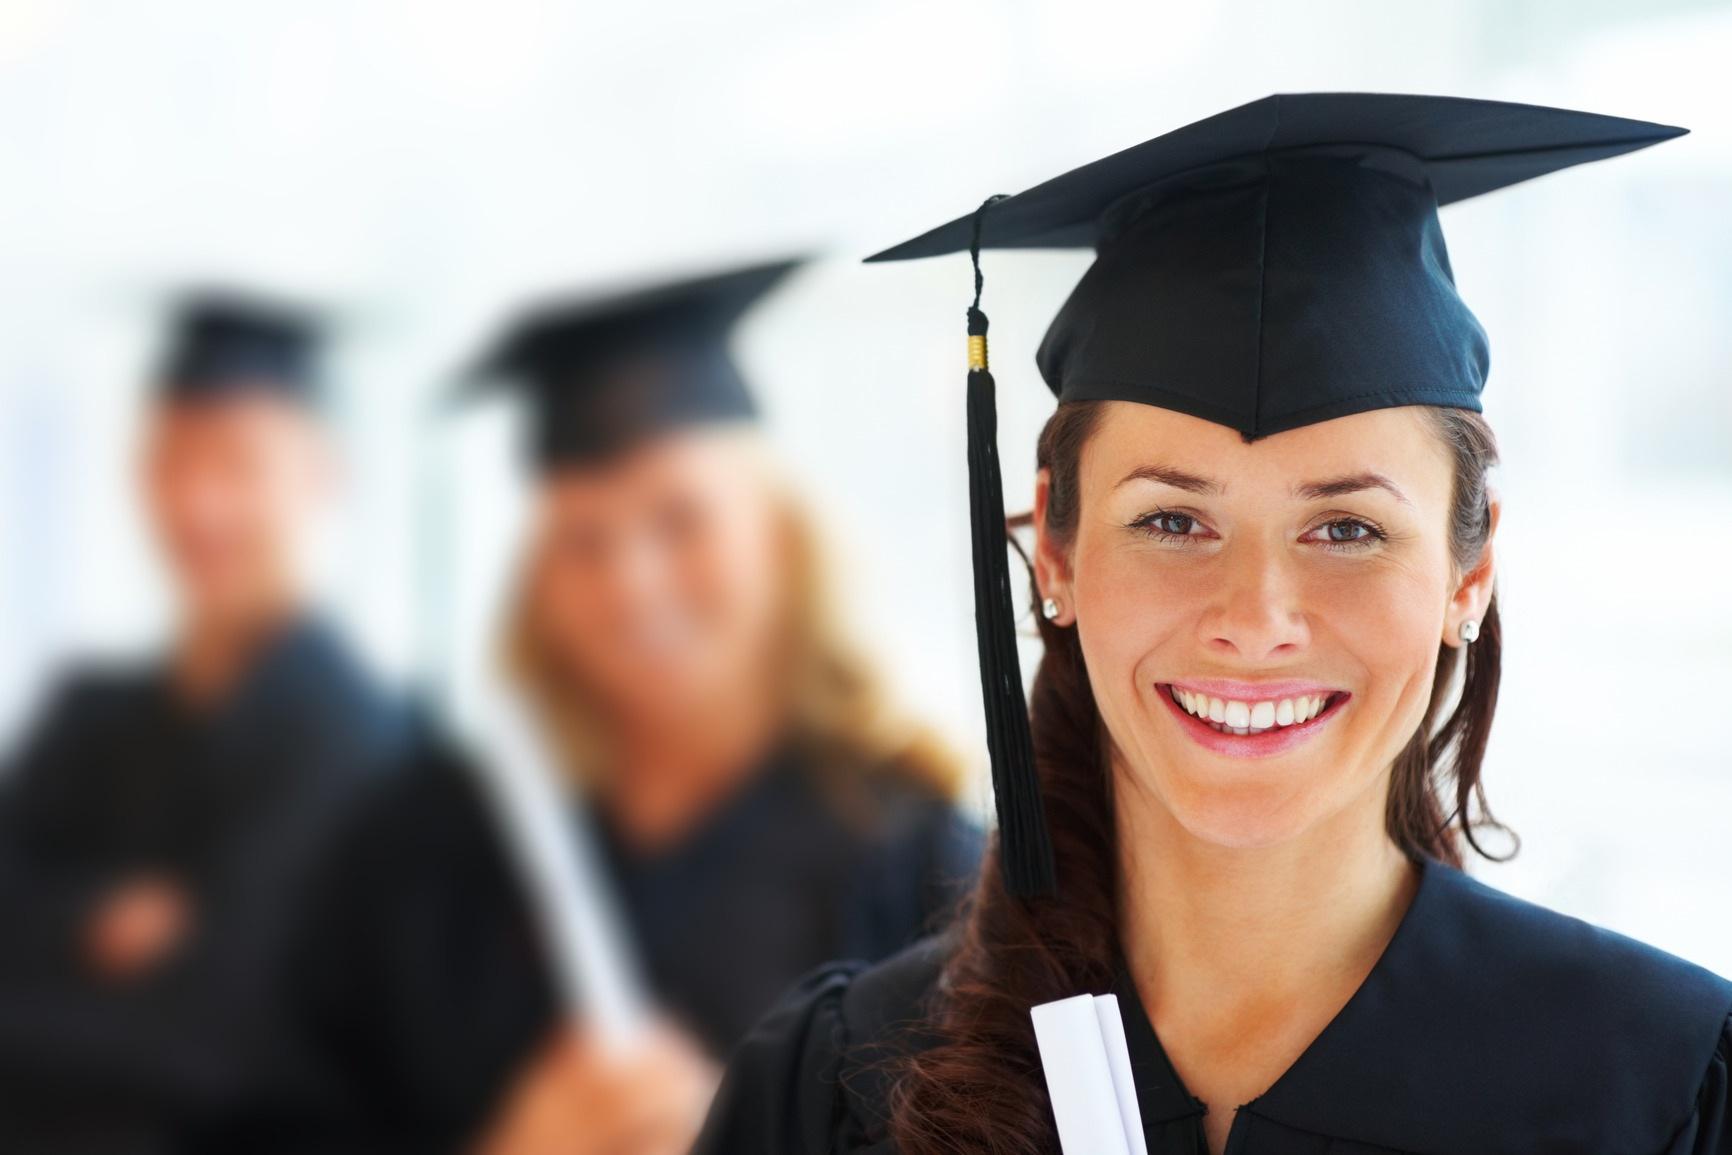 В чем разница бакалавриата, специалитета и магистратуры?